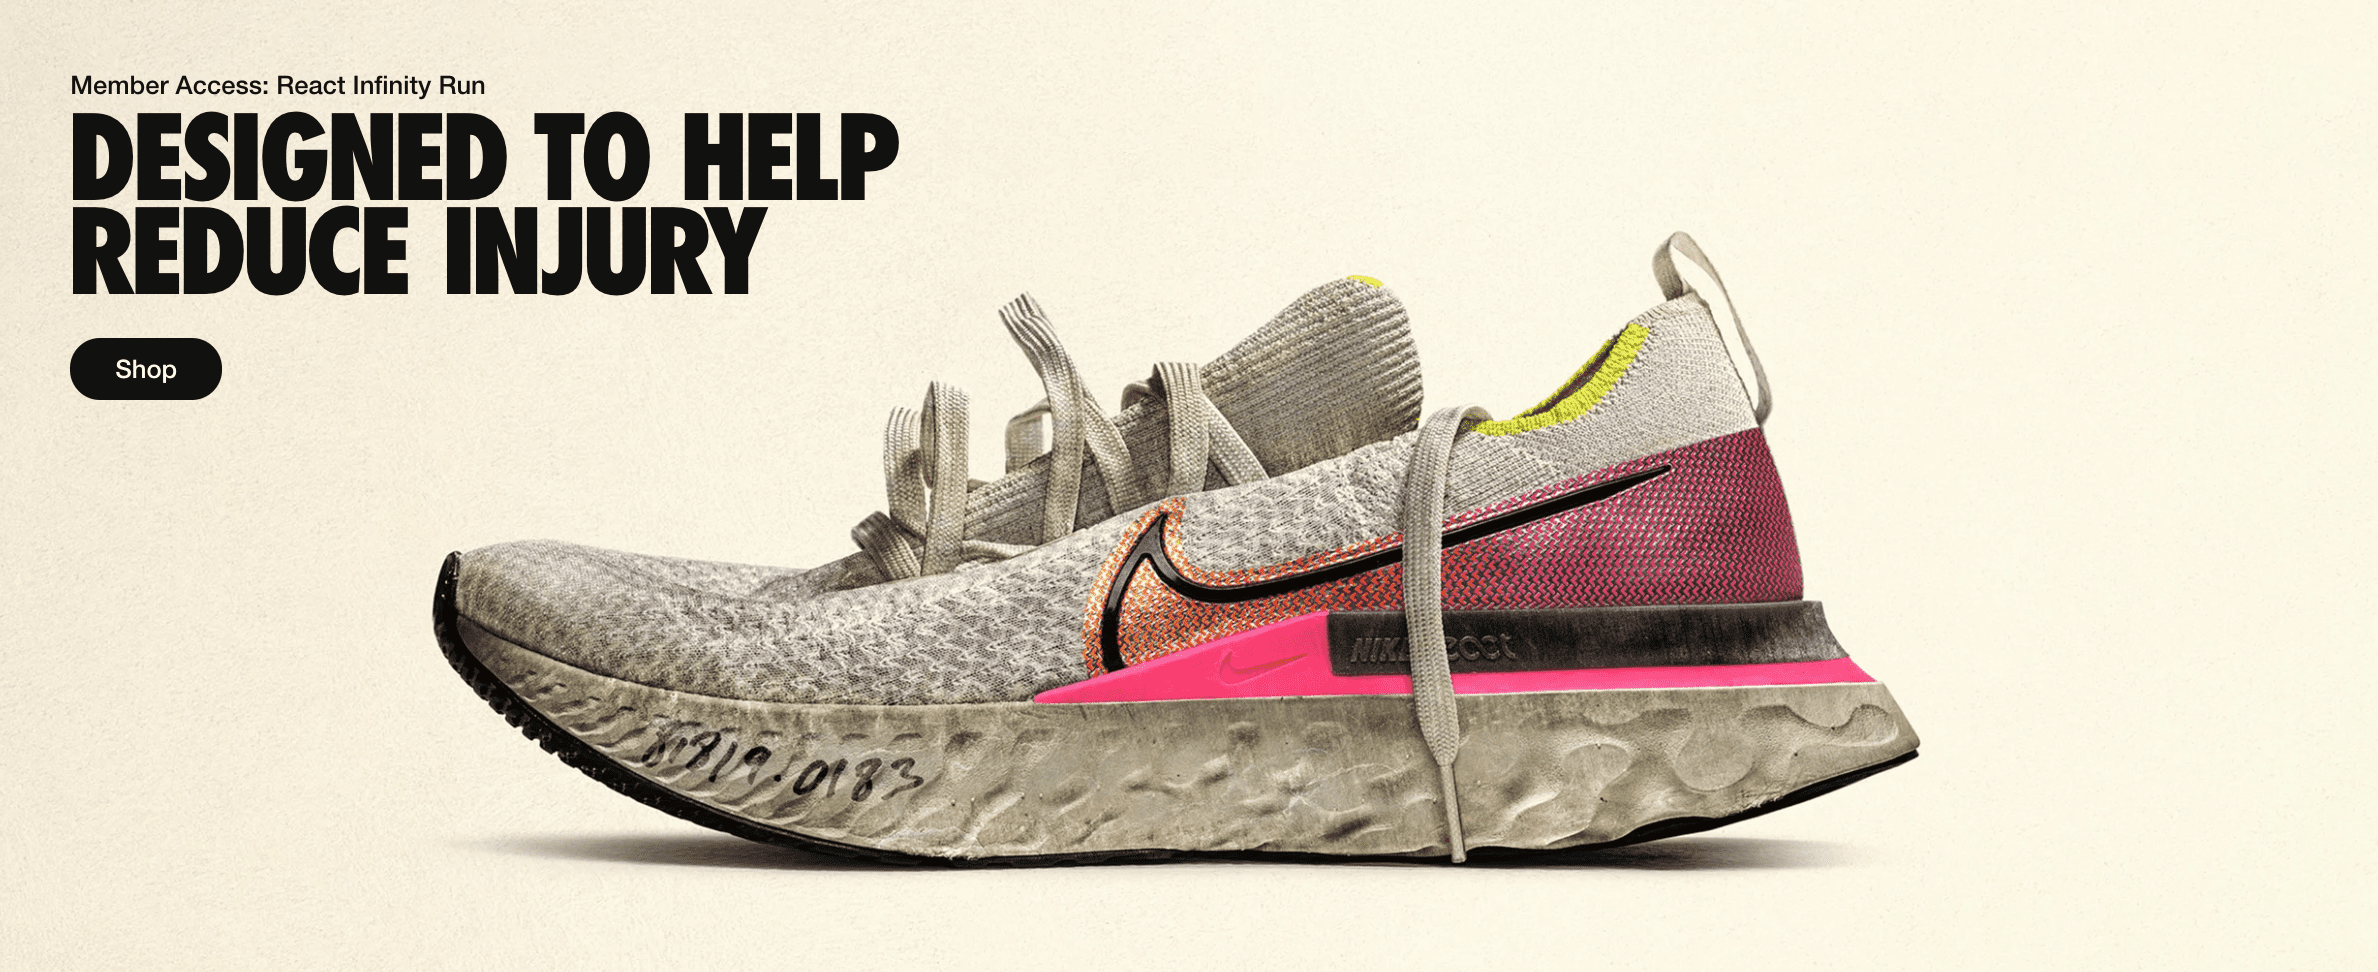 Nike product designed to help reduce injury